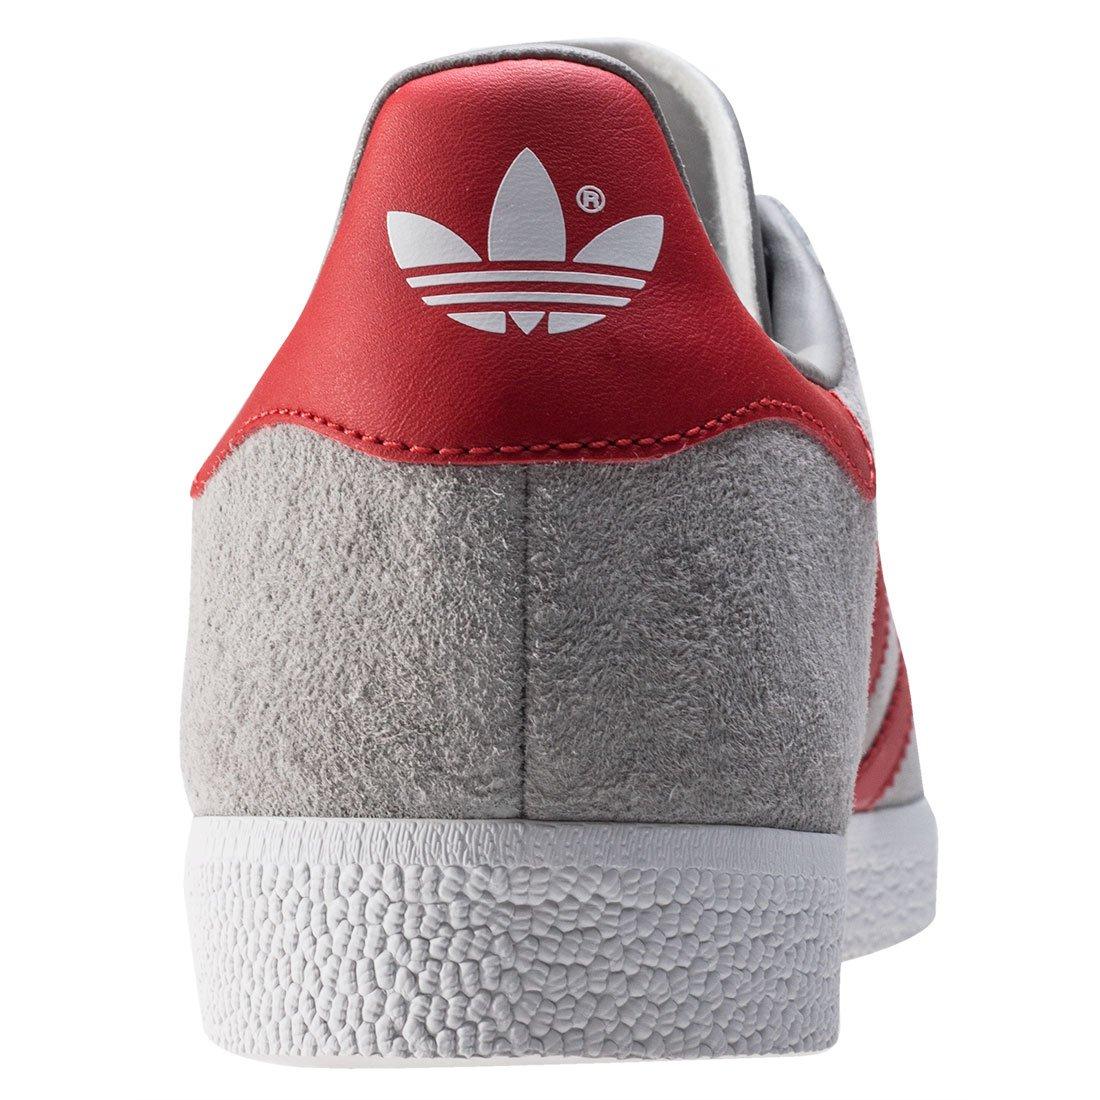 red J W Scarpa Gazelle Adidas silver Onix O5qBXwW1